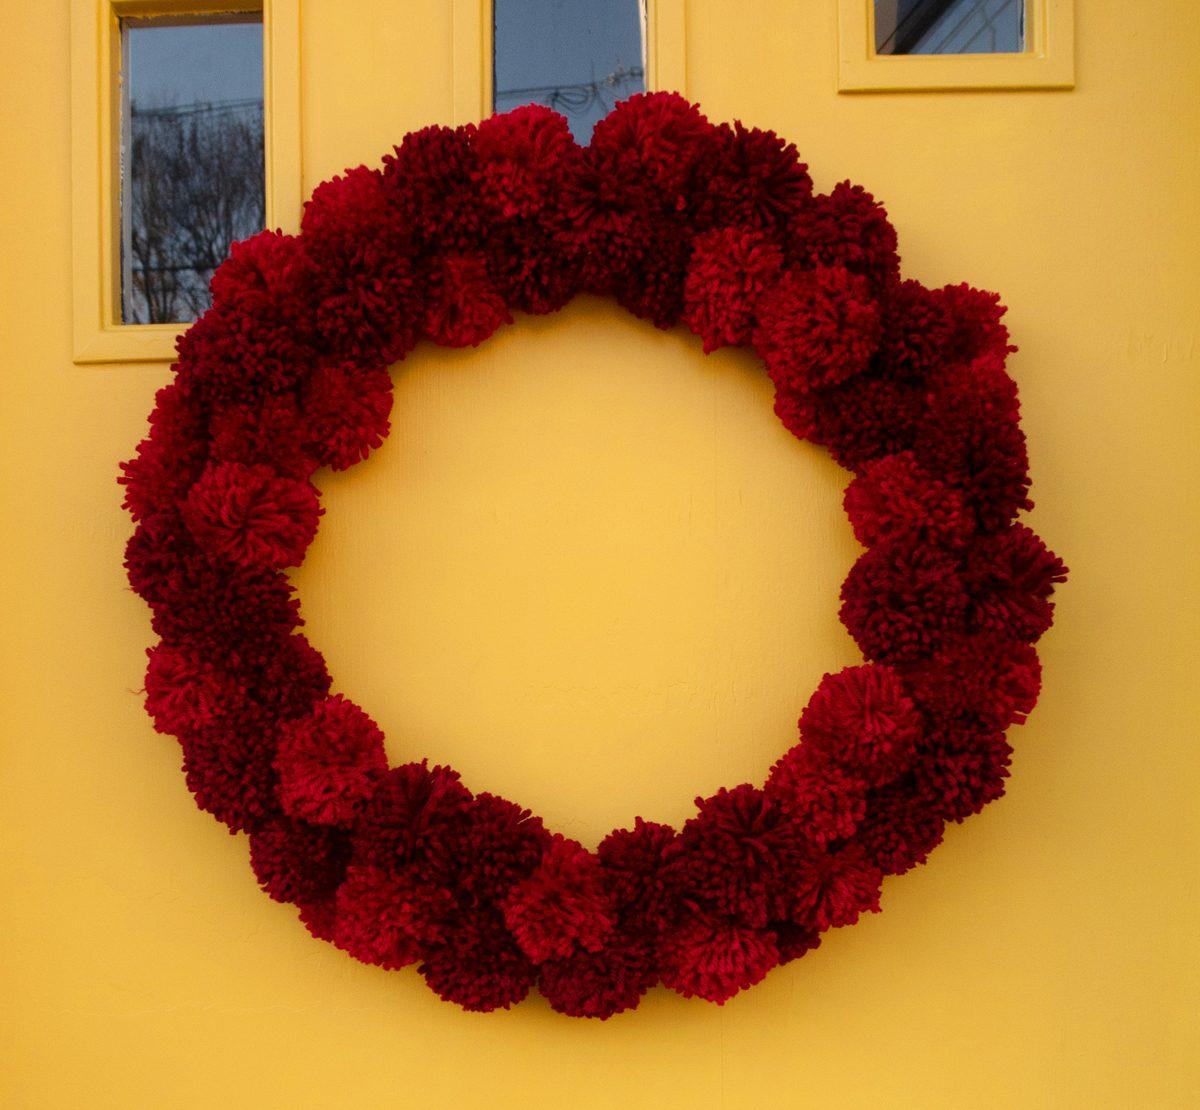 How To Make A Pom Pom Wreath Weekend Craft